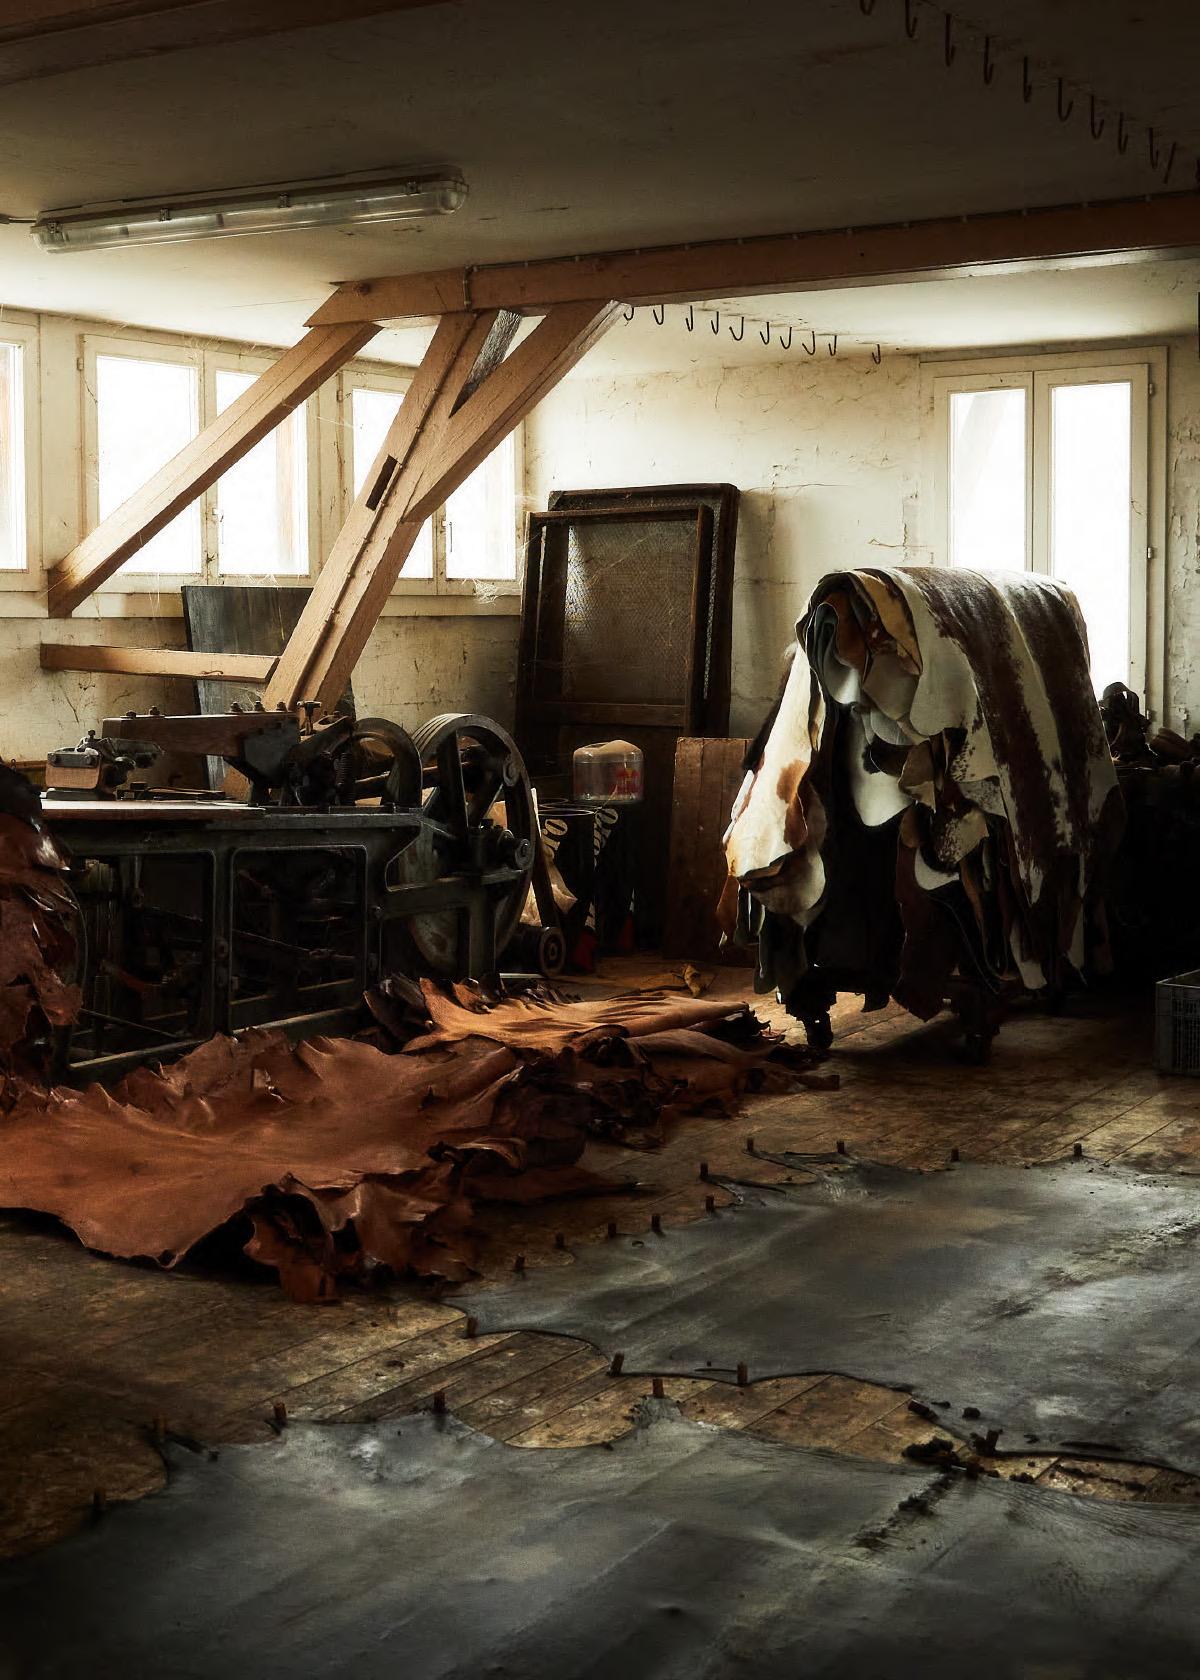 Gerberei Jürg Zeller Steffisburg Büffelleder Lederlager im obersten Stockwerk des Gerberhauses, am Boden aufgespannte Bisonhäute zur Trocknung.